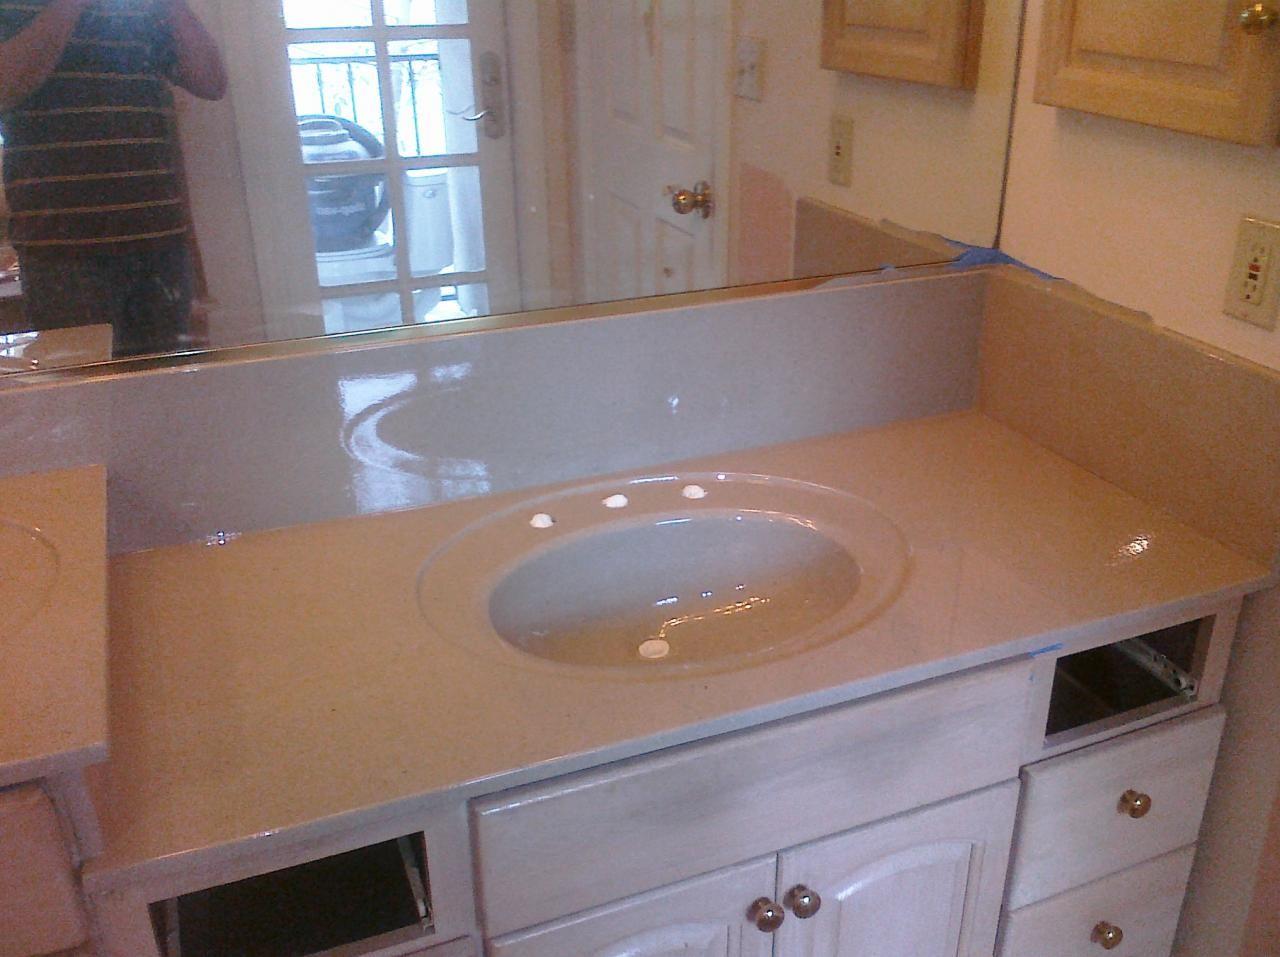 PKB Reglazing : Cultured Marble Countertop U0026 Sink Combo Reglazed Moonstone  Speckled